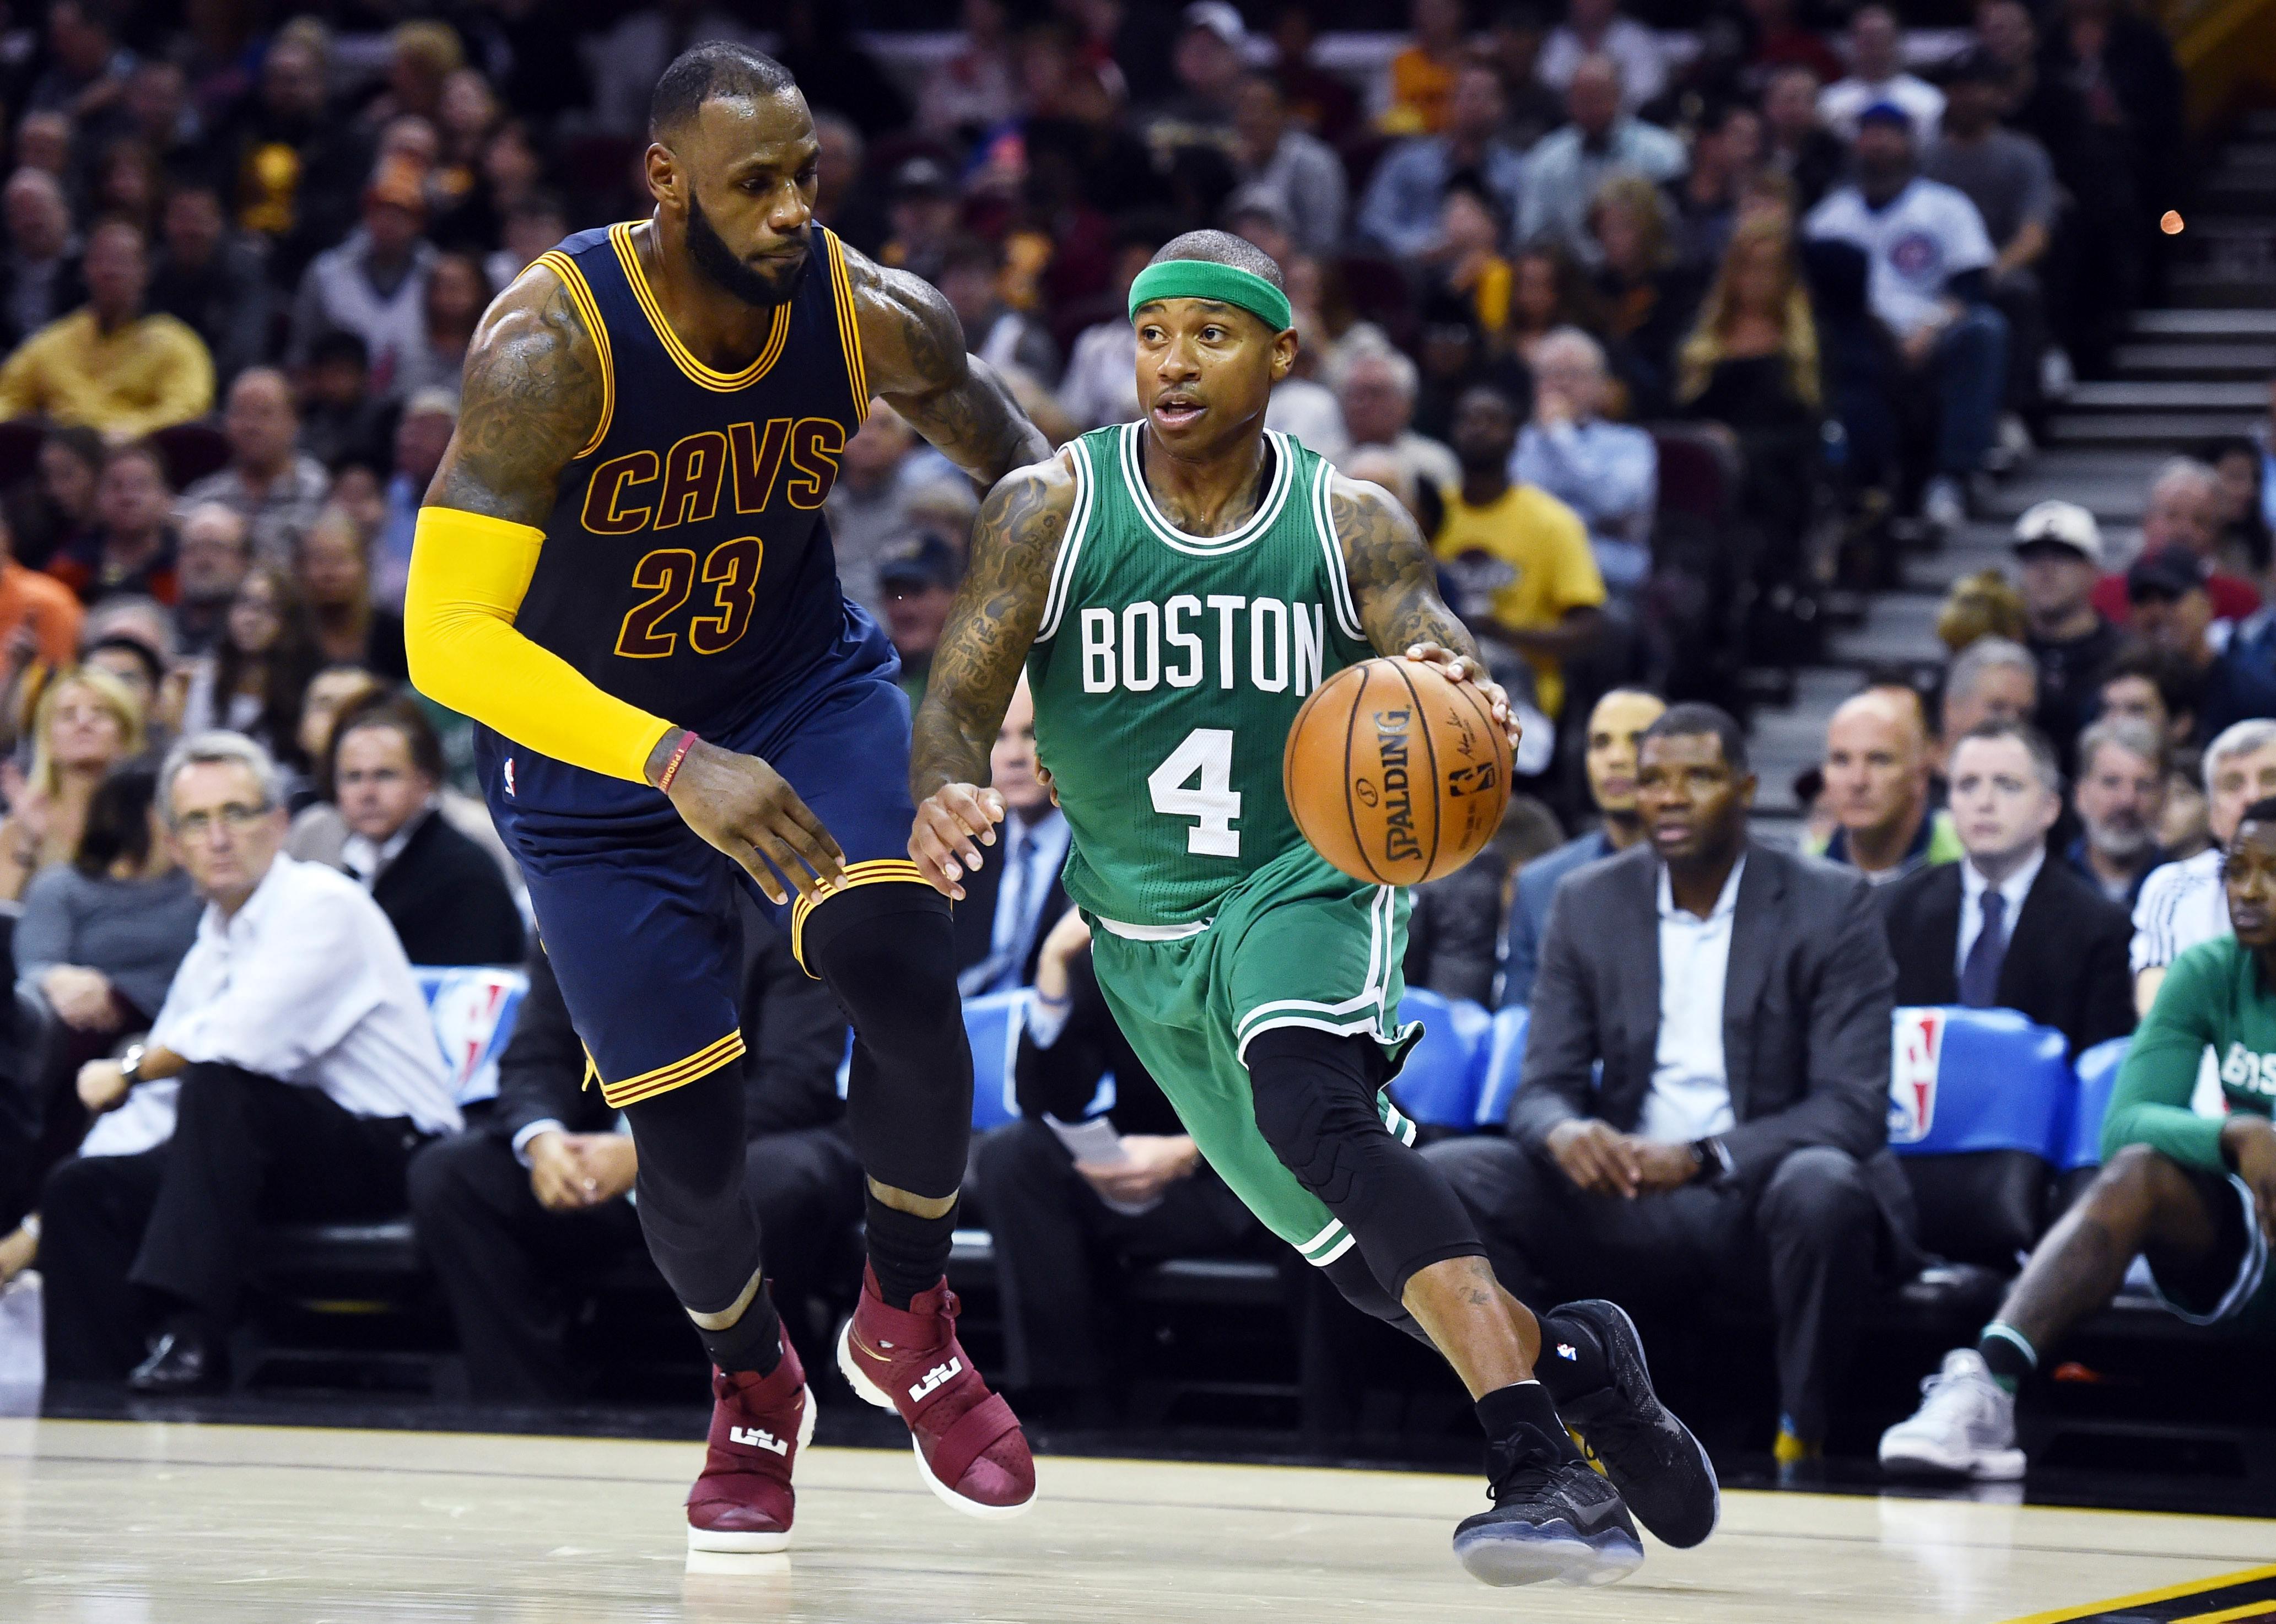 NBA Odds Favor Cavaliers Over Celtics, Warriors Look Like ...